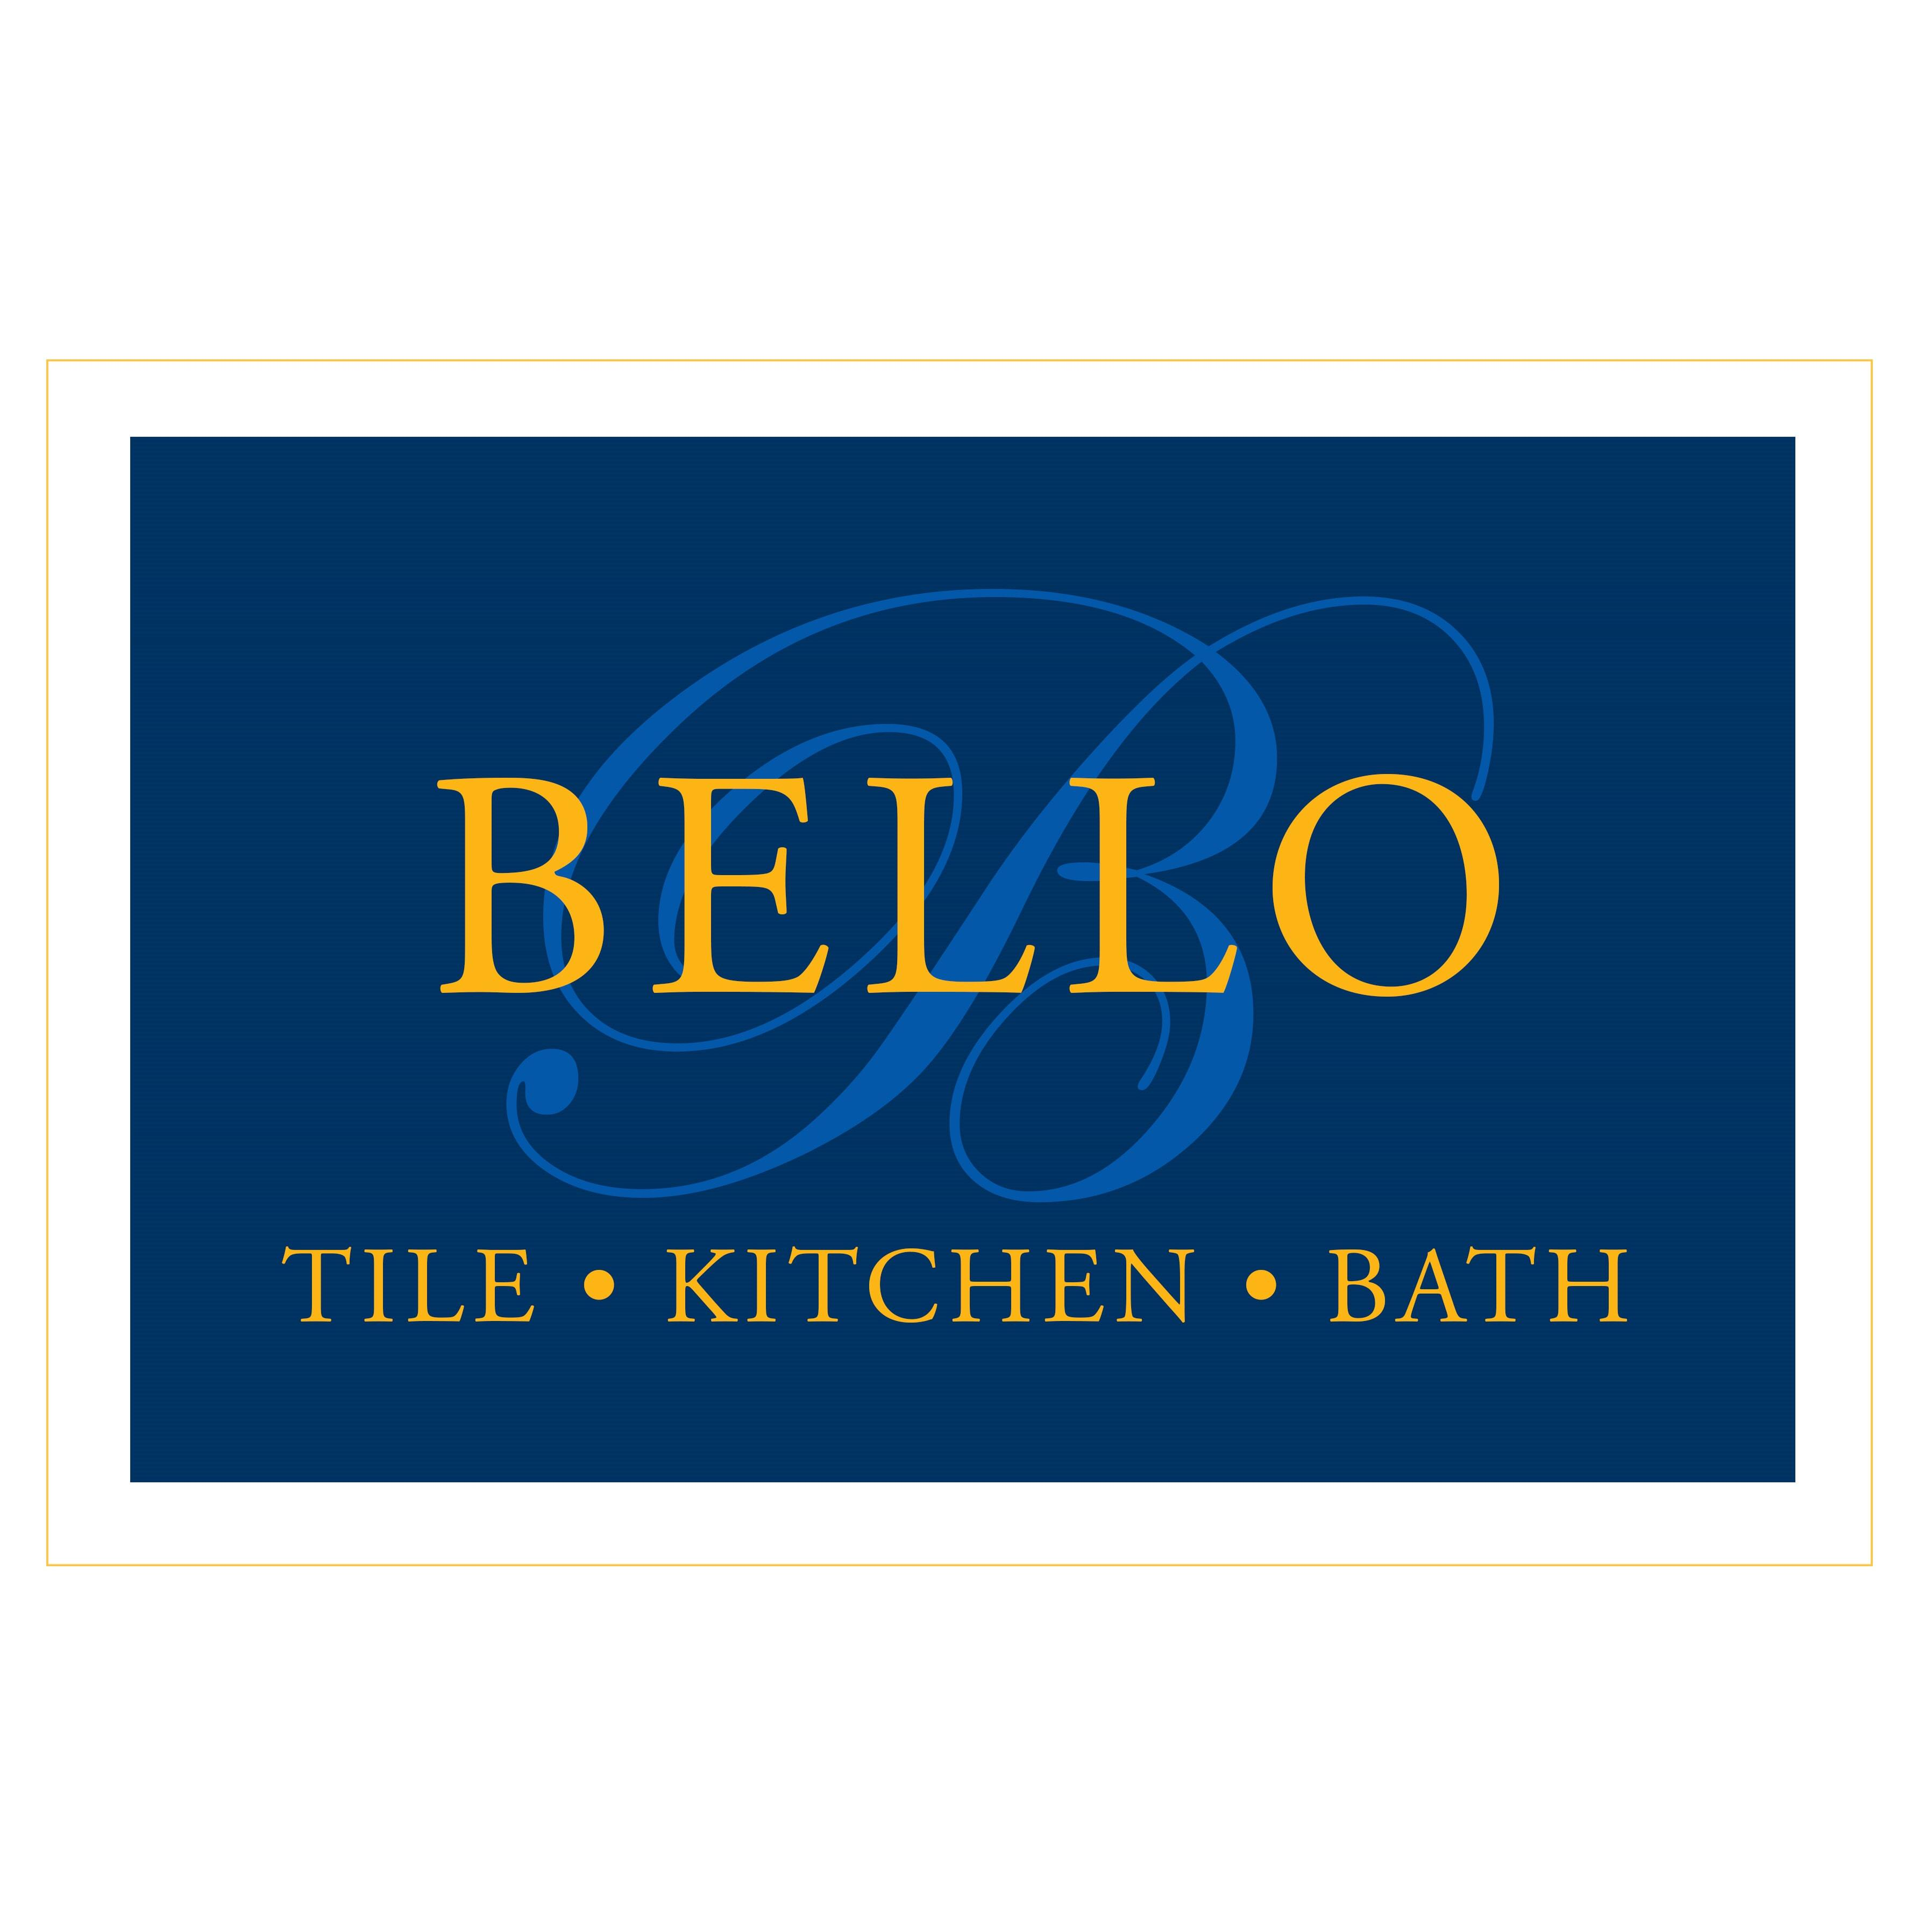 Bello Bath and Kitchen